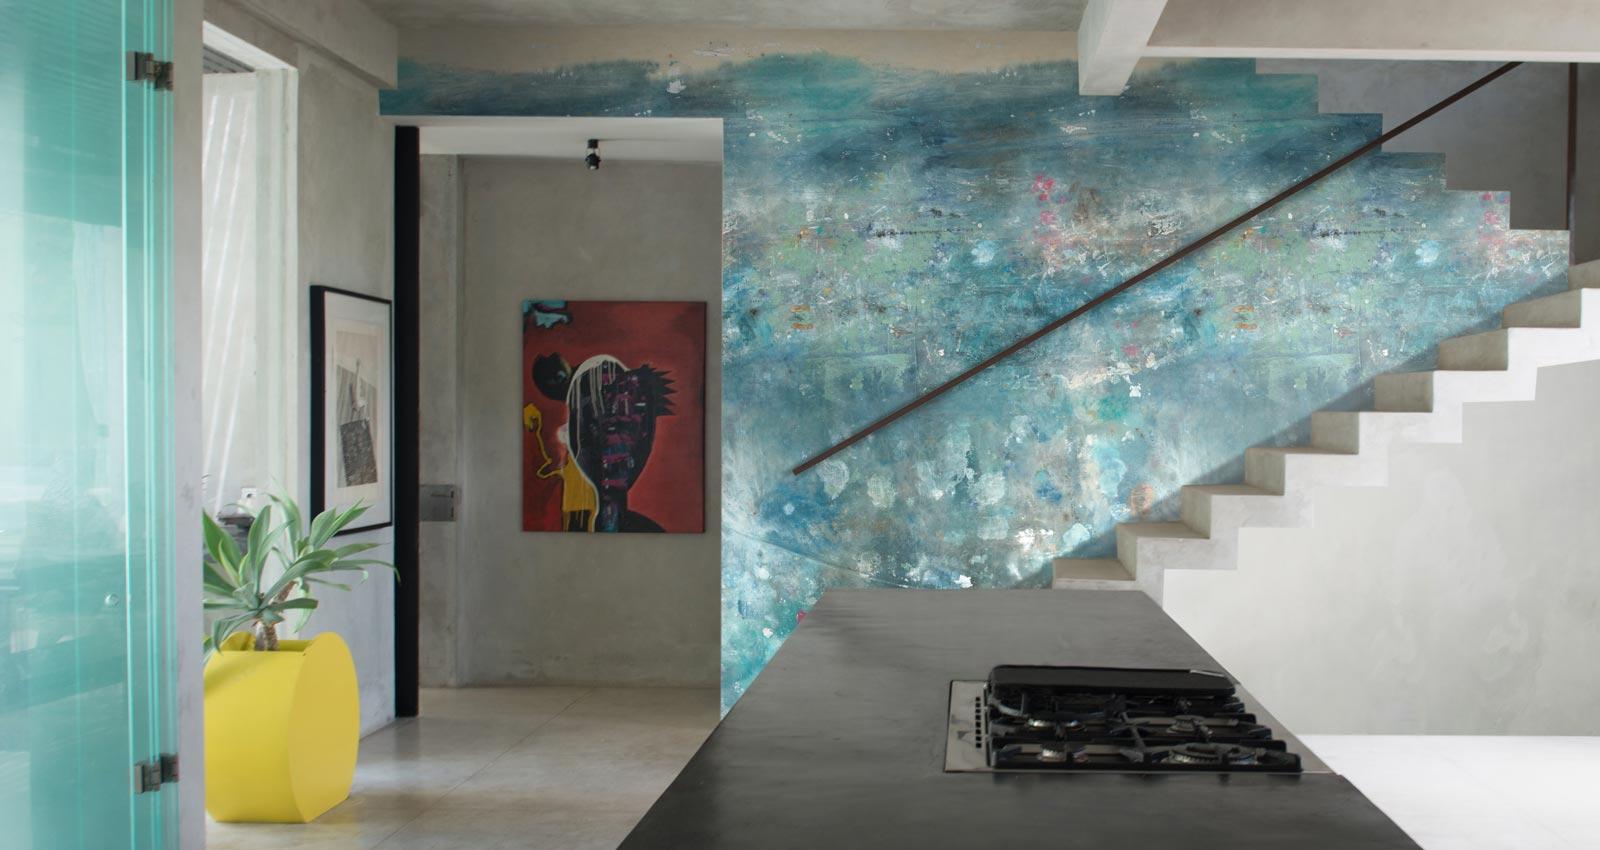 Modern Style of Wallpaper Designs